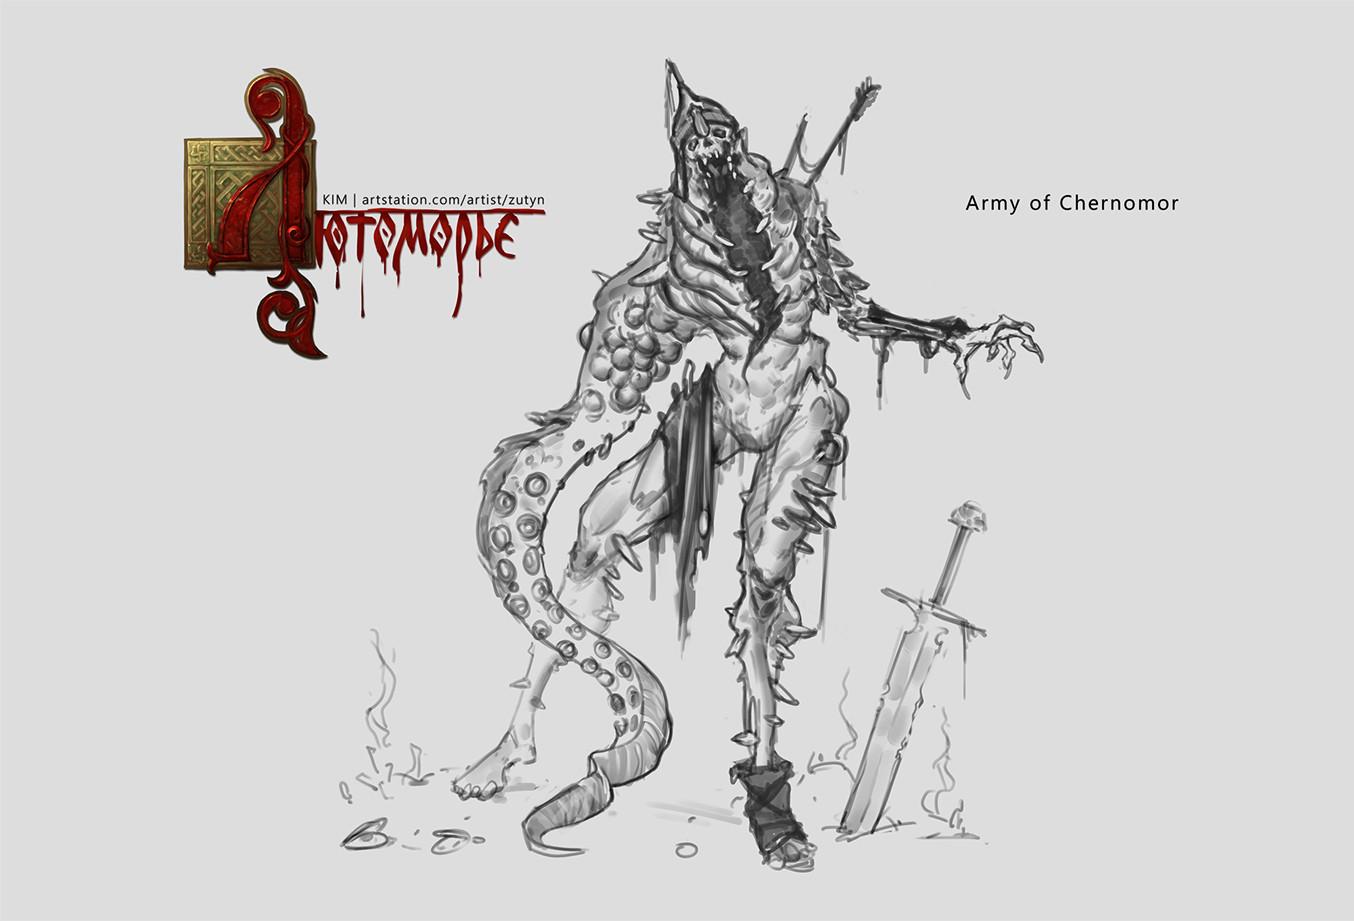 Artyom kim chernomor 1